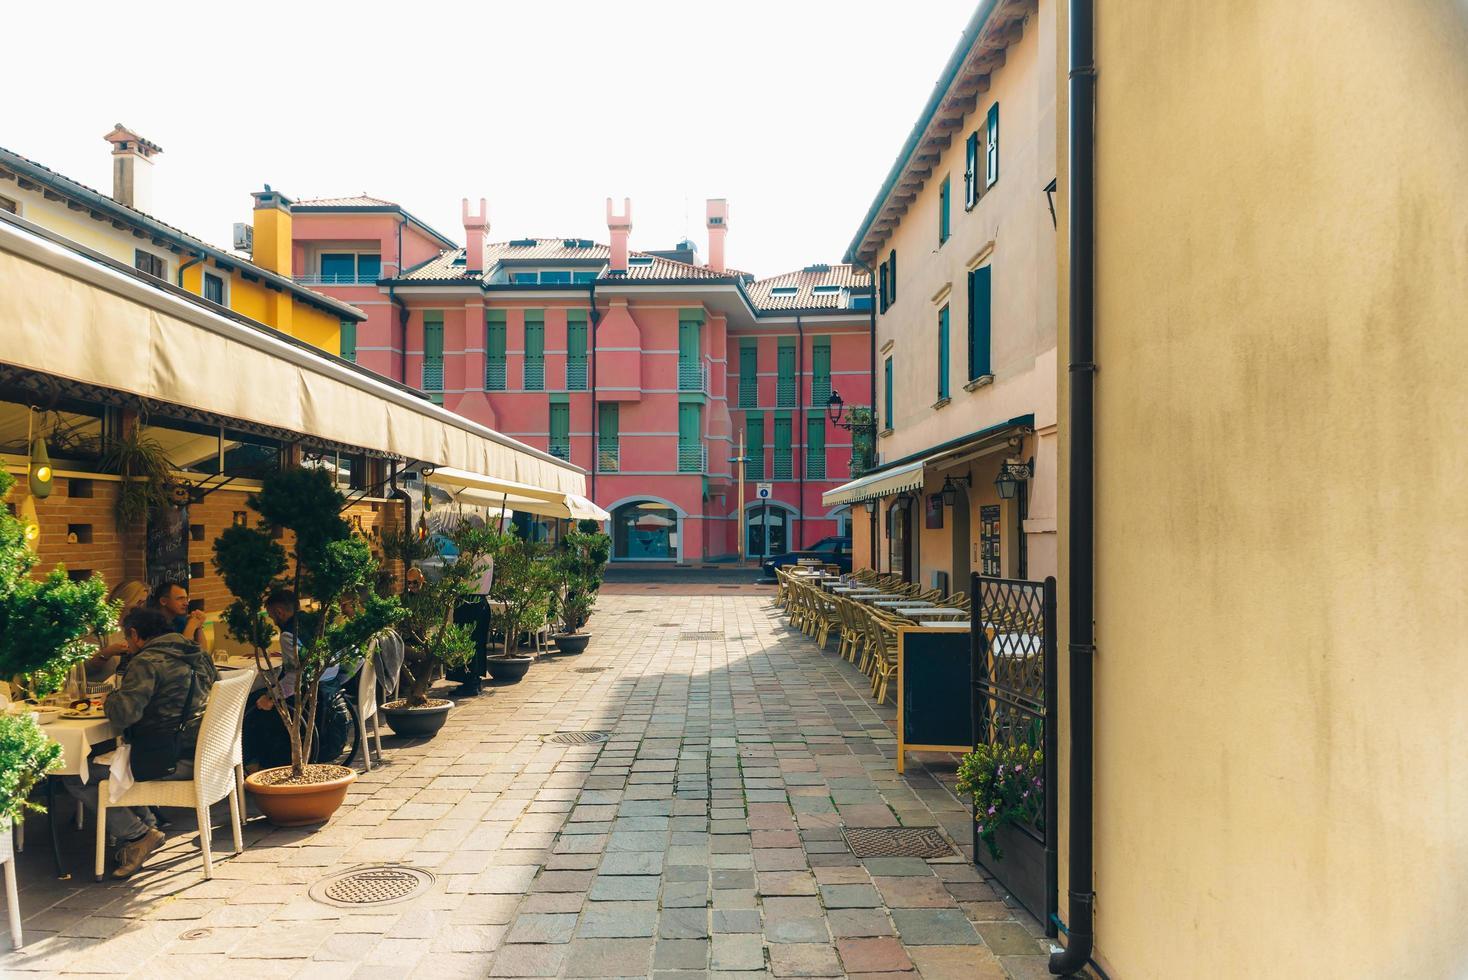 Caorle, Italië 2017- toeristisch district van de oude provinciestad Caorle in Italië foto